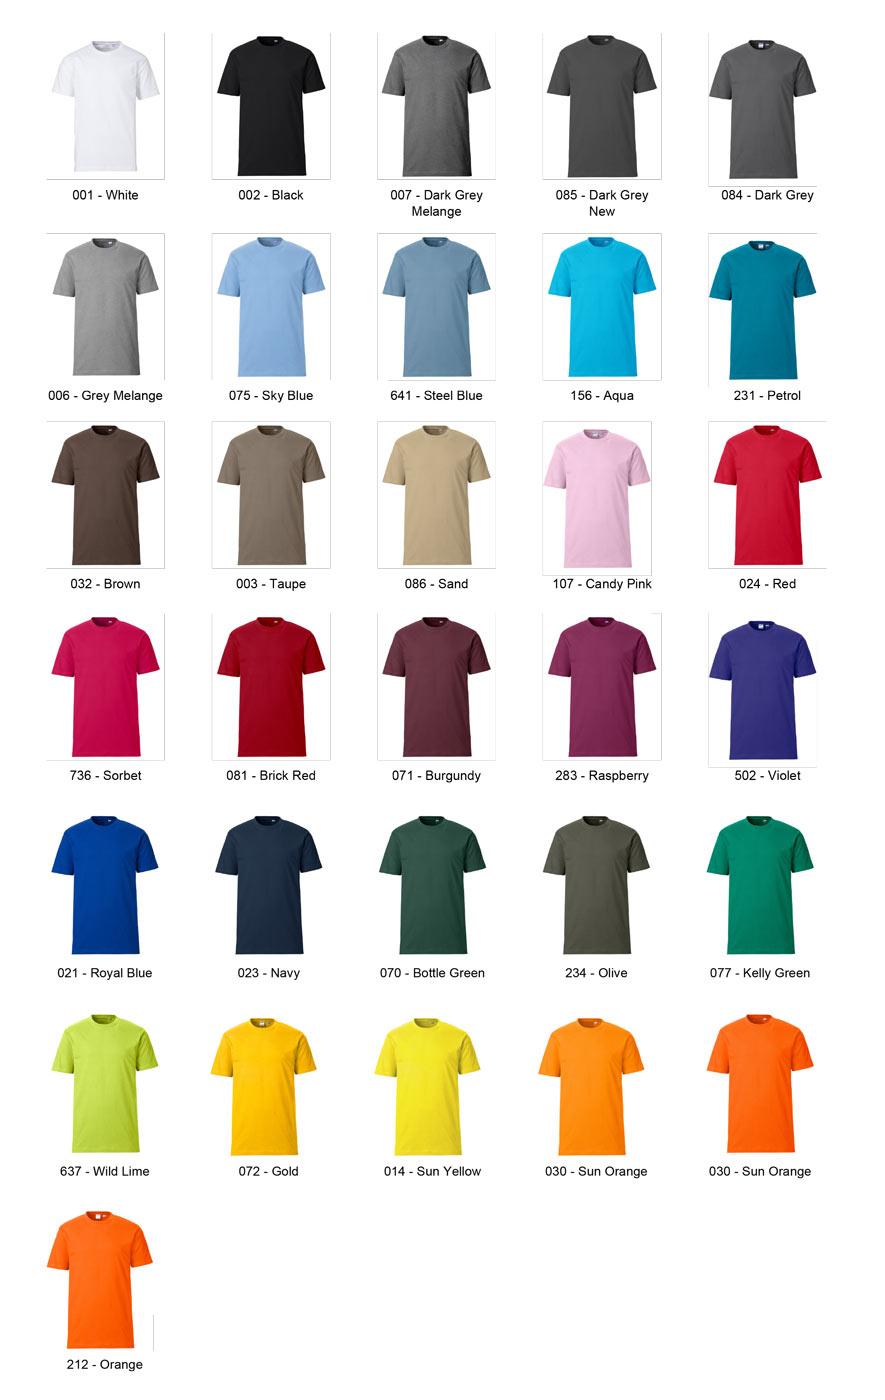 strandkoerbe-amrum-shirts-farben